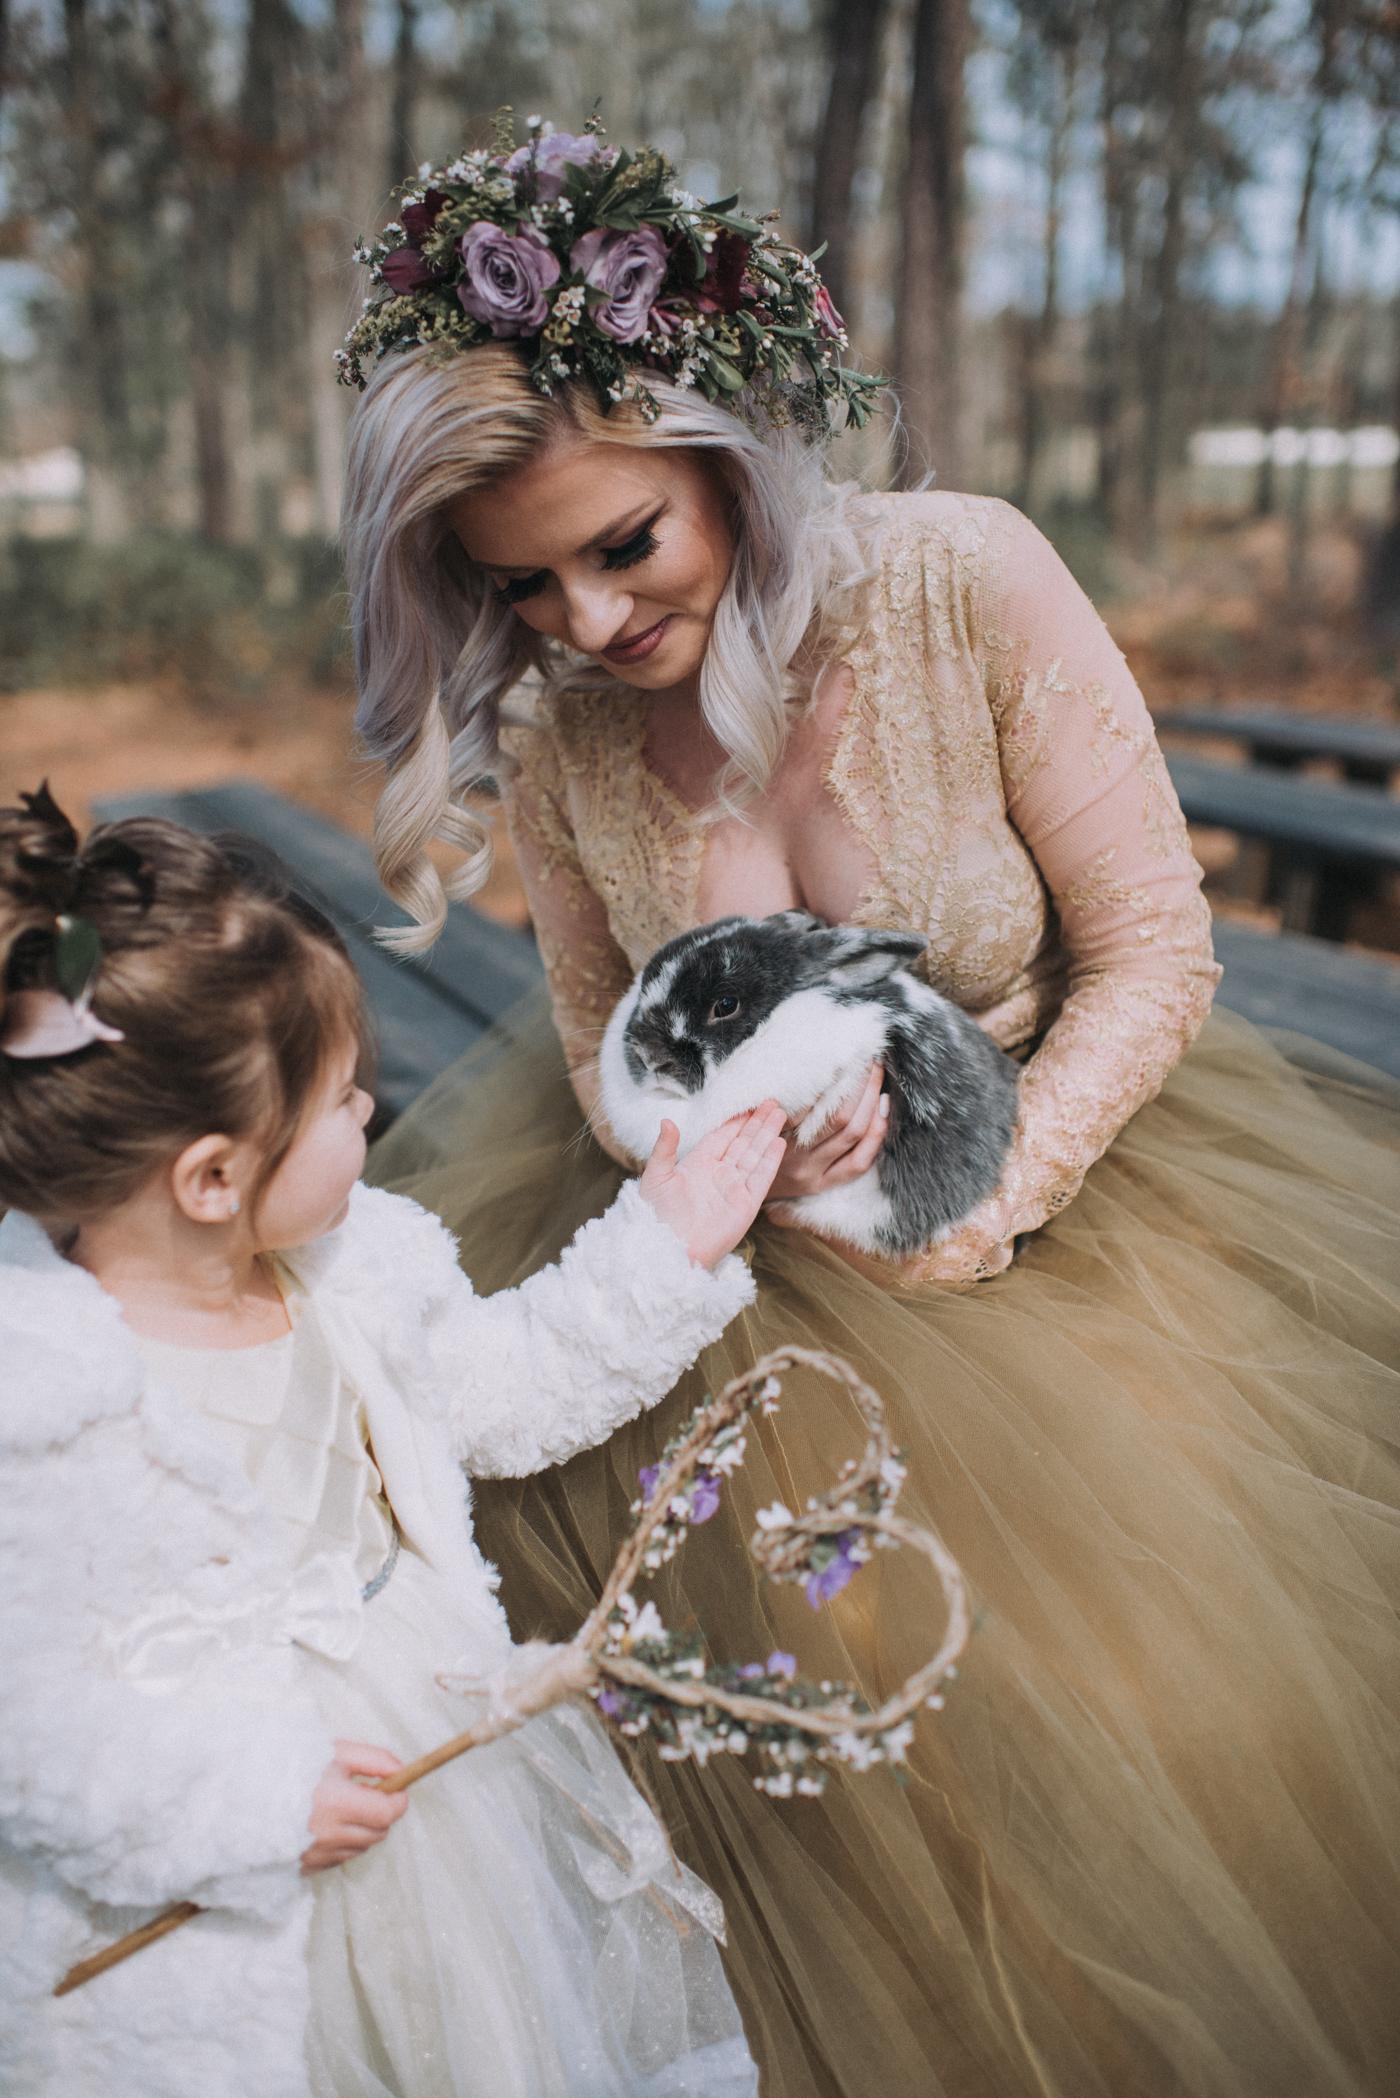 NJ Wedding, Running Deer Golf Club, Flower Girl, Wand, Bunny, Samantha Jay Photography